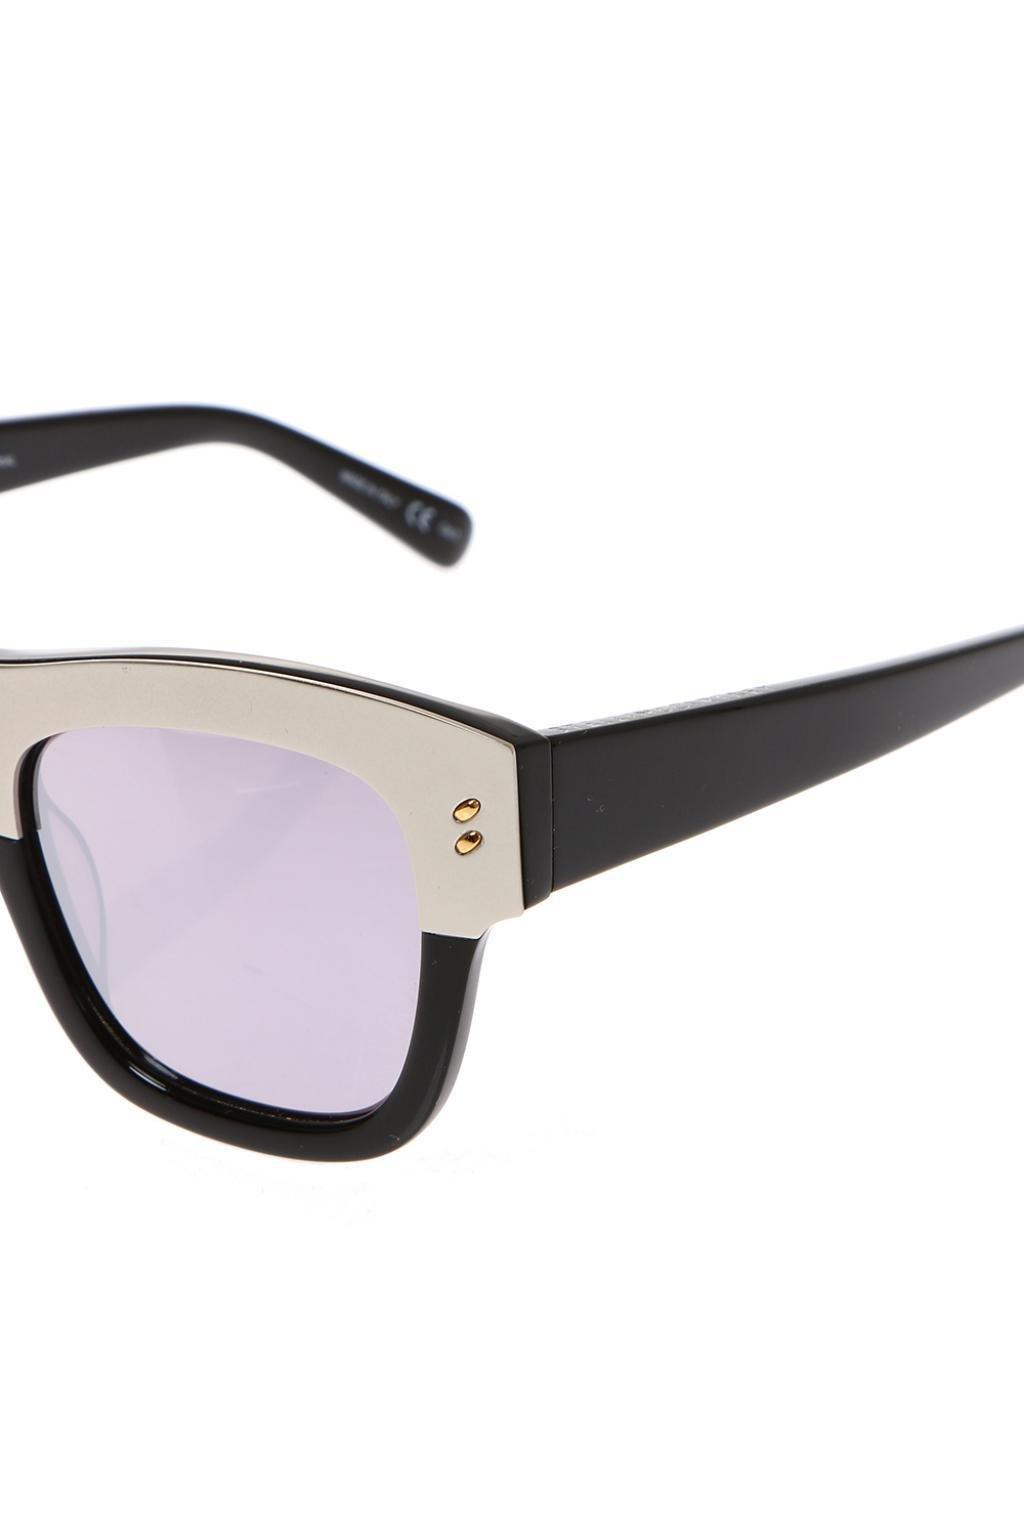 Stella McCartney Sunglasses in Silver (Metallic)